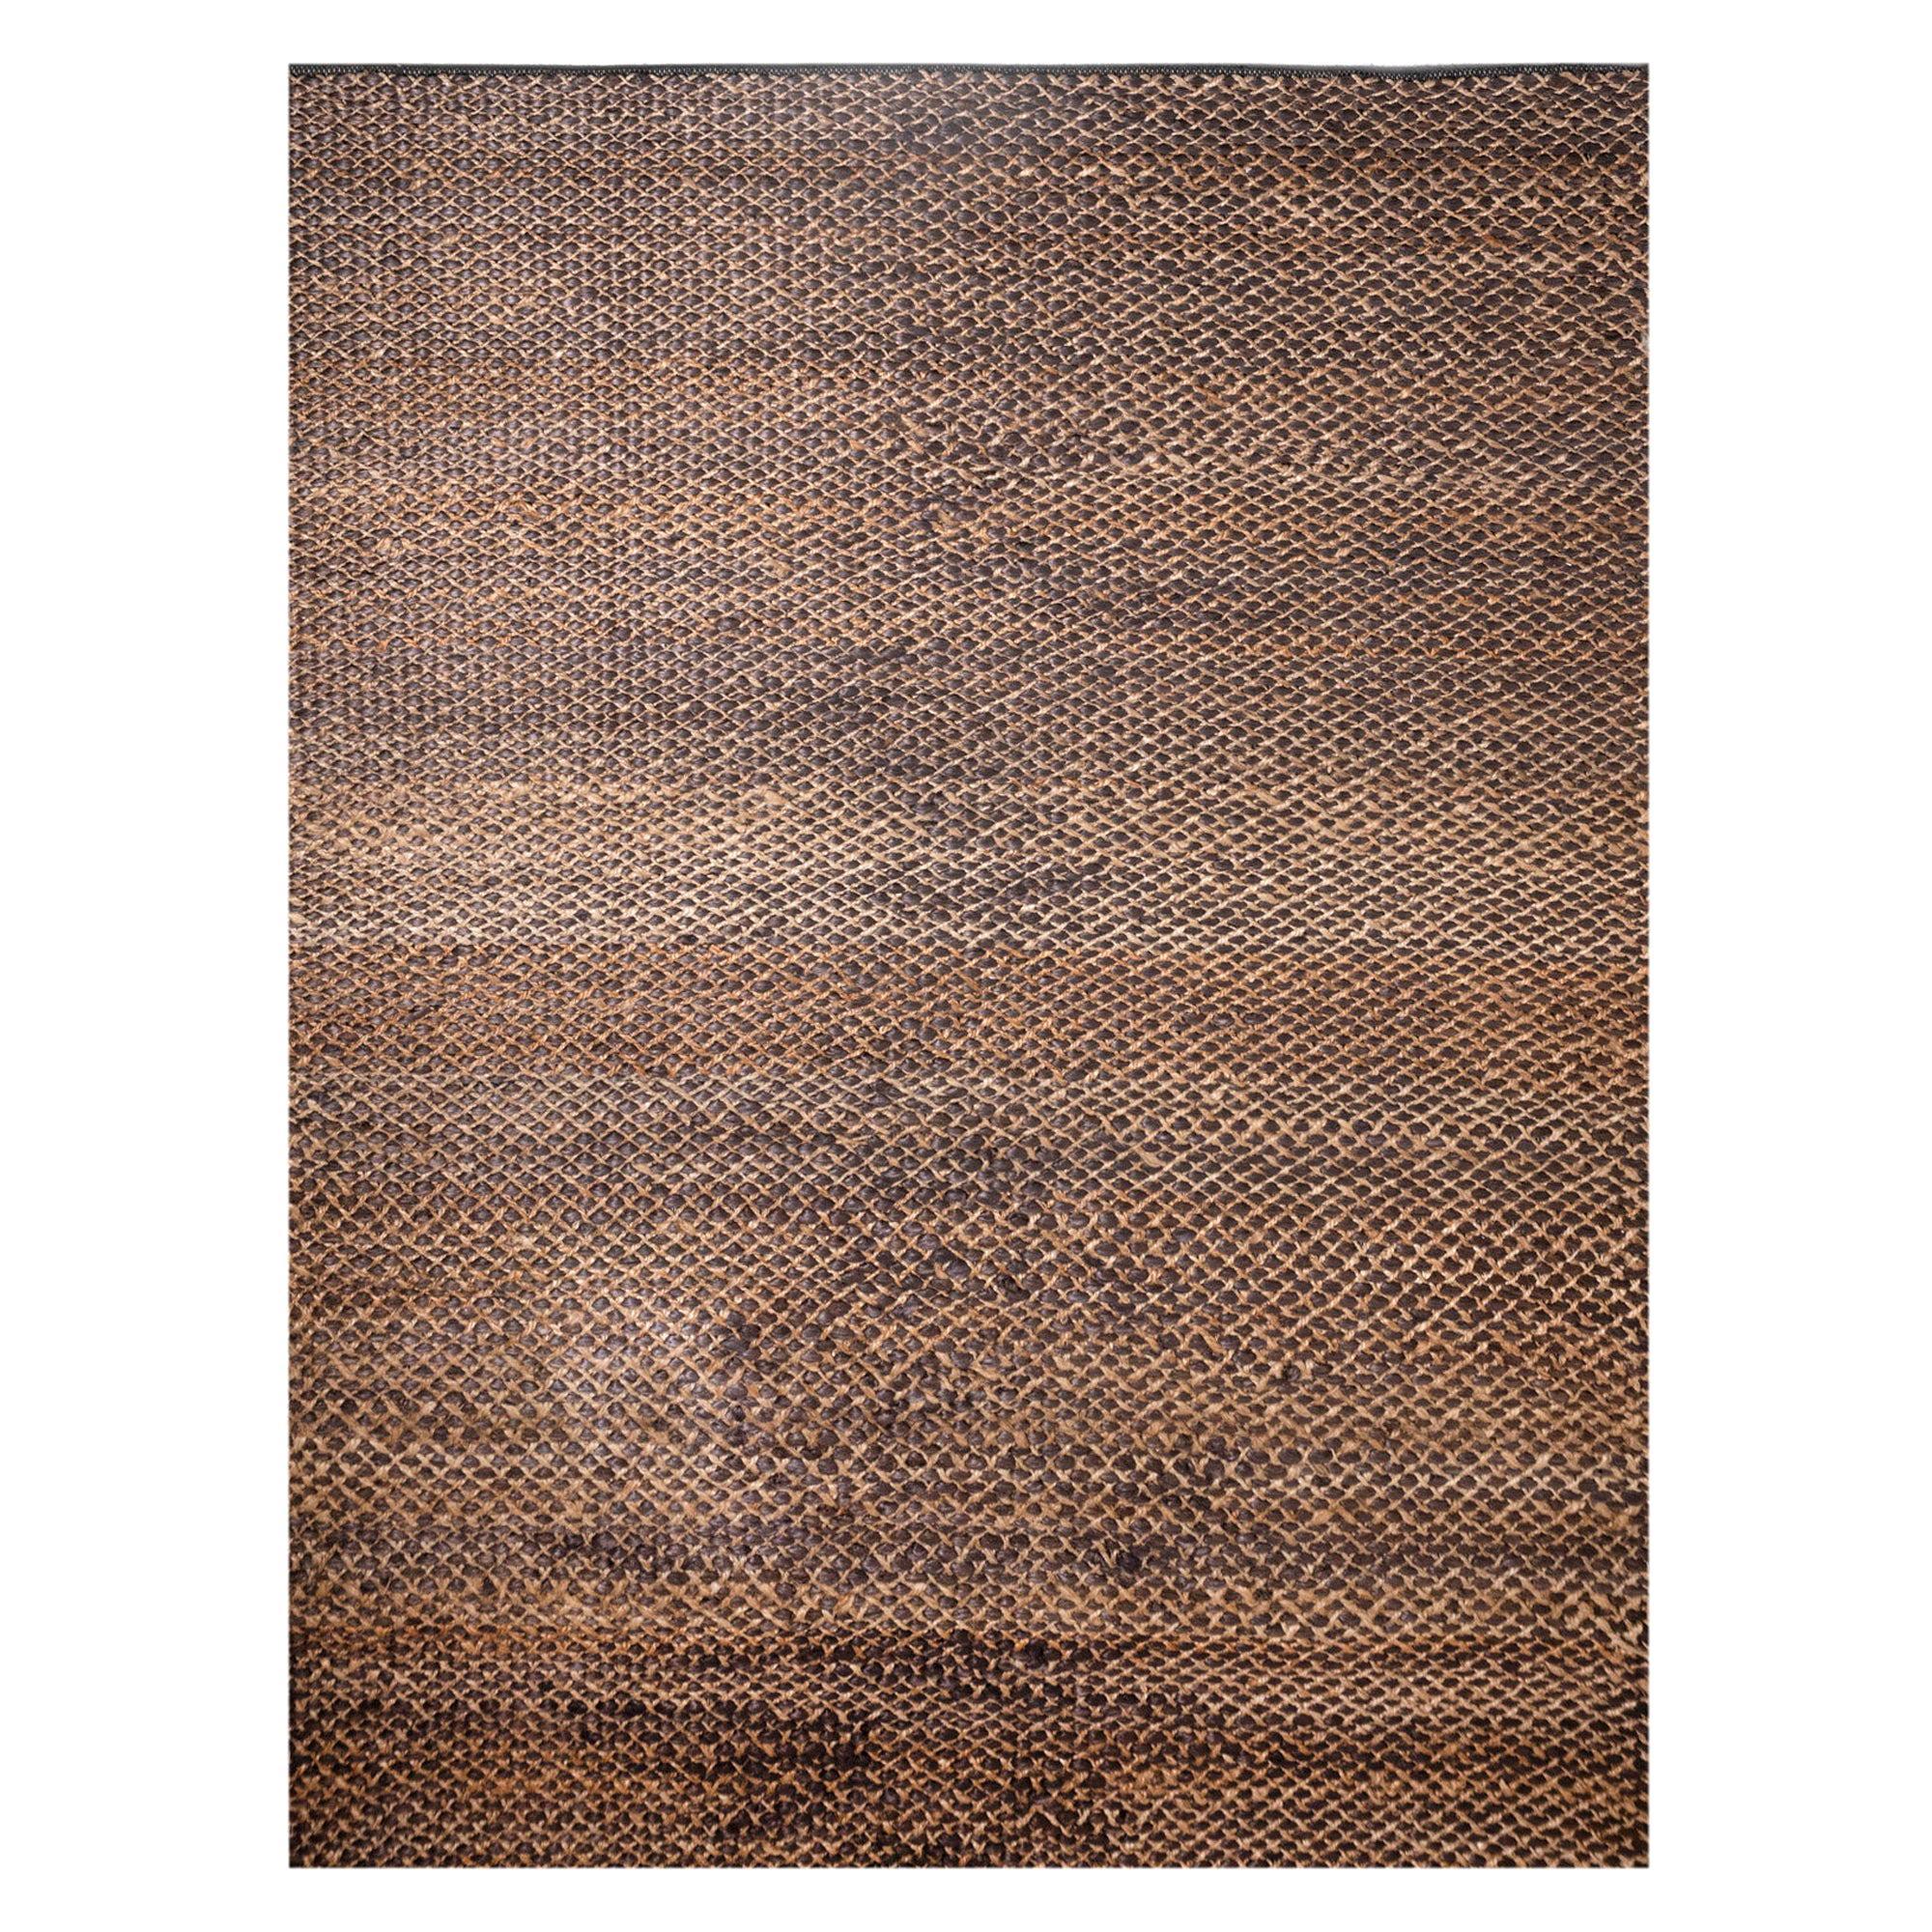 21st Century Modern Jute Braided Carpet Rug by Kilombo Home Natural&Black